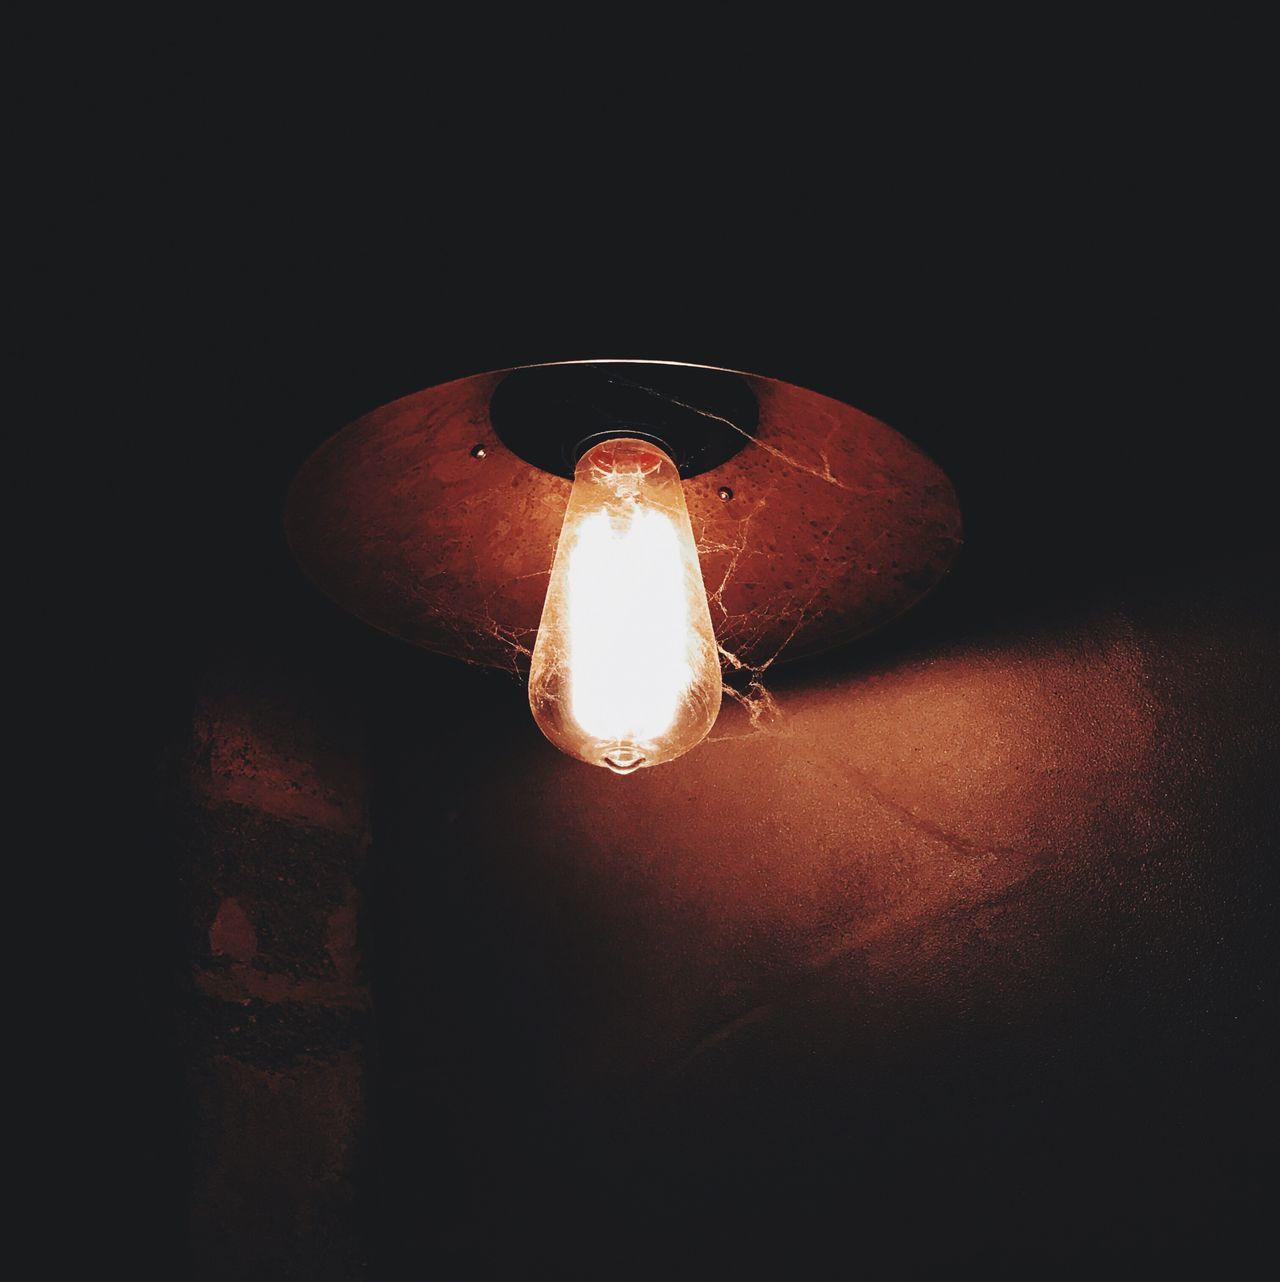 Lighting Equipment Electricity  Light Bulb Illuminated Close-up Black Background Power Supply No People Indoors  Night Filament